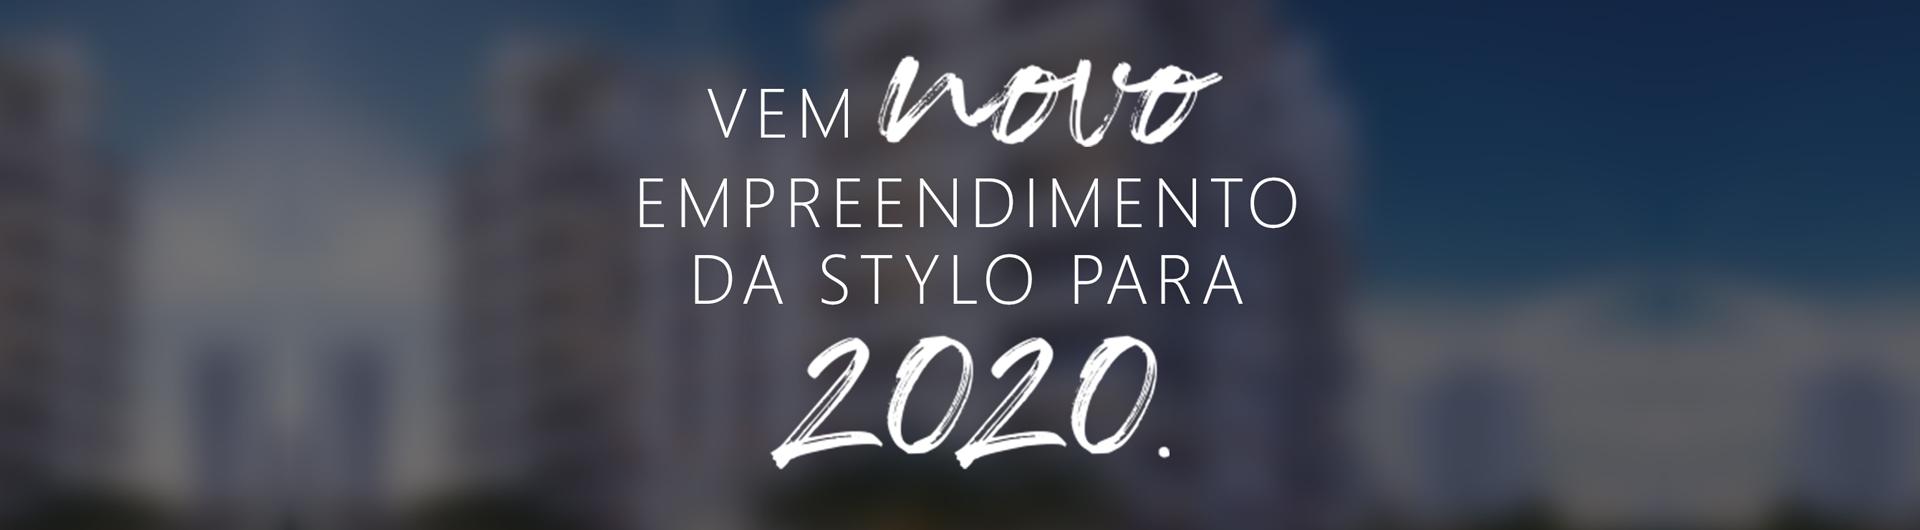 banner_empreendimentonovo-2